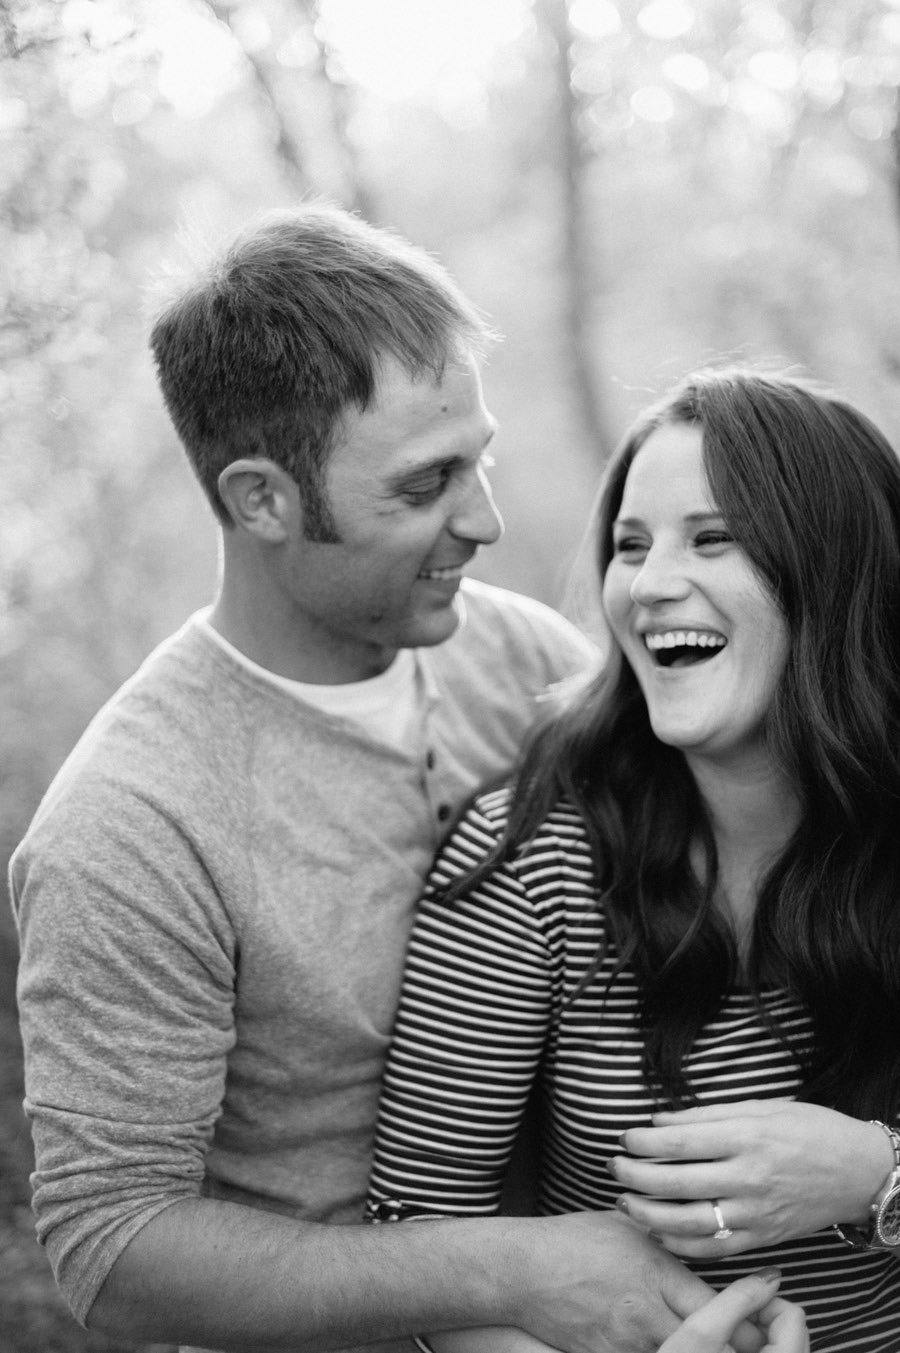 Craig and Erica Engagement-3.jpg